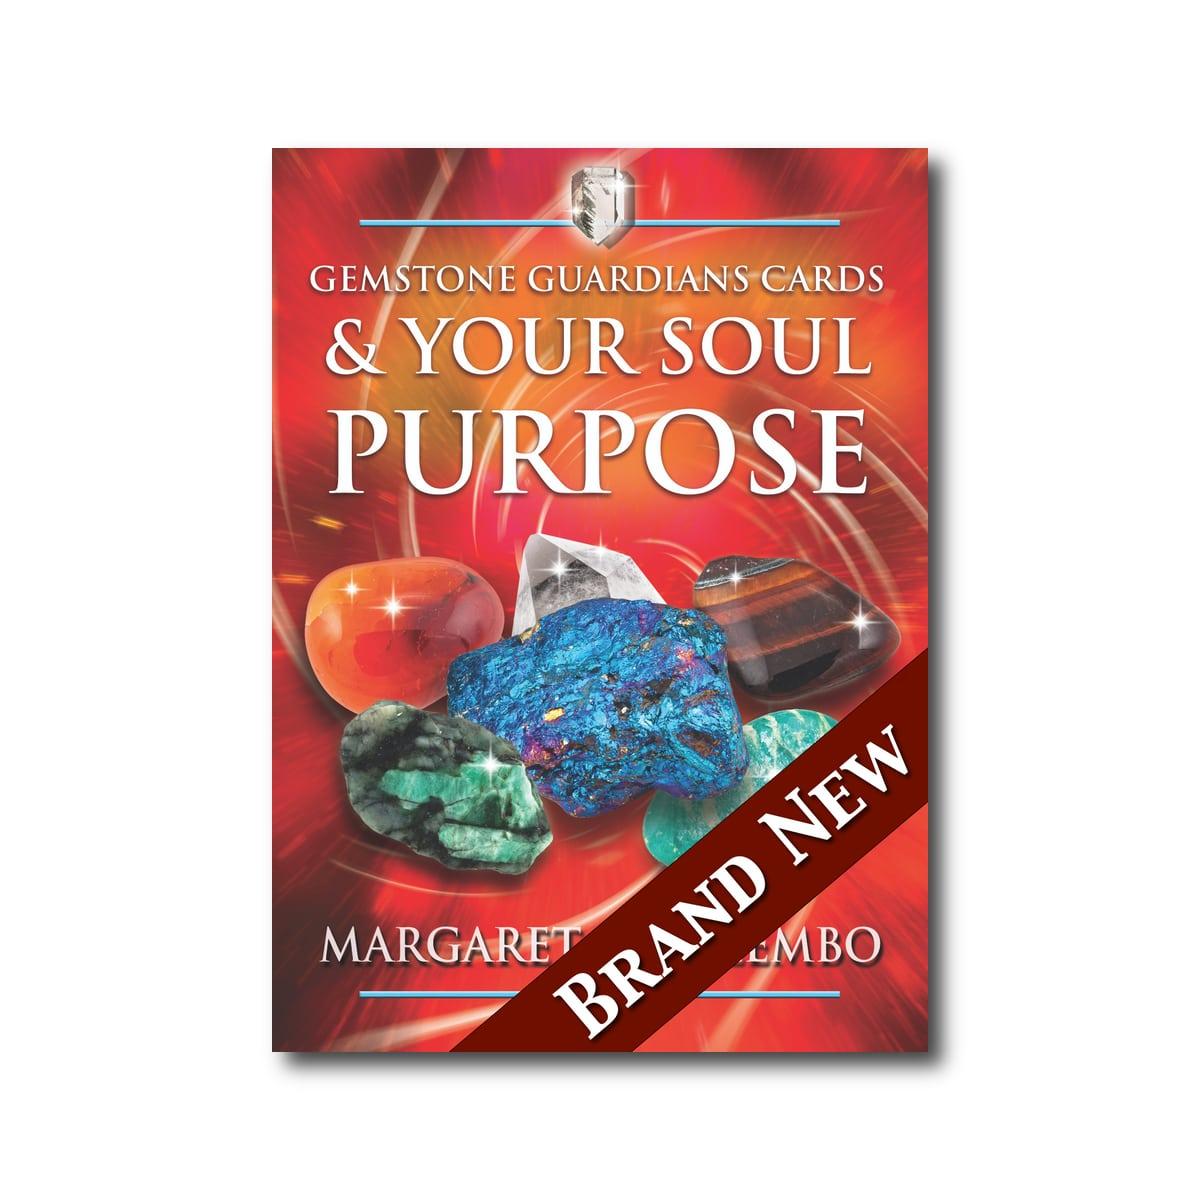 Your-Soul-Purpose-Thumbnail